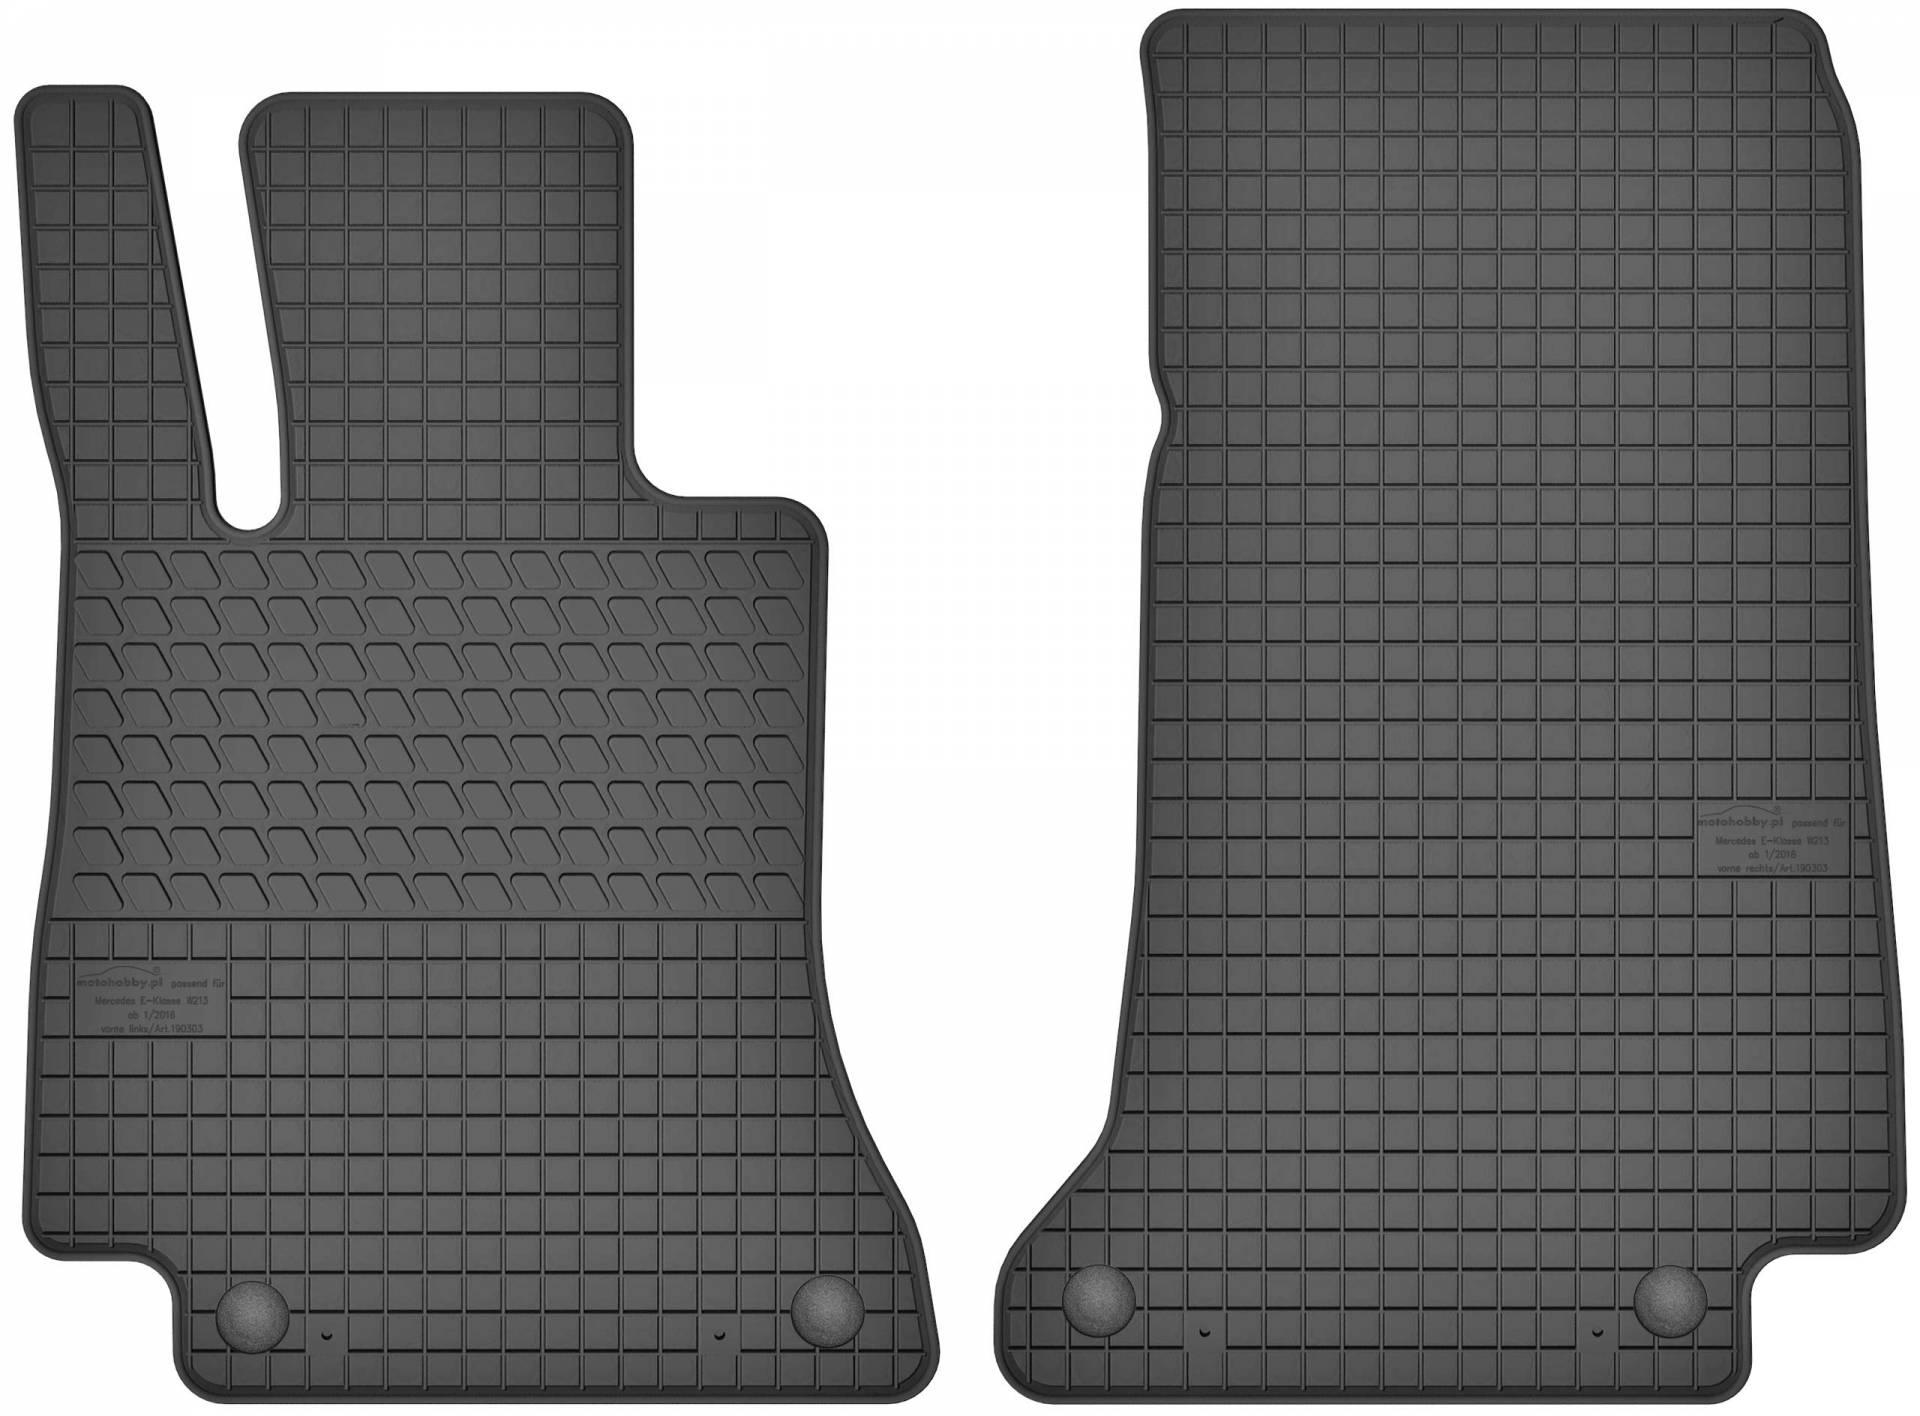 Gummimatten Gummi Fußmatten für Peugeot Partner 2 II 2008-2016 Set Motohobby